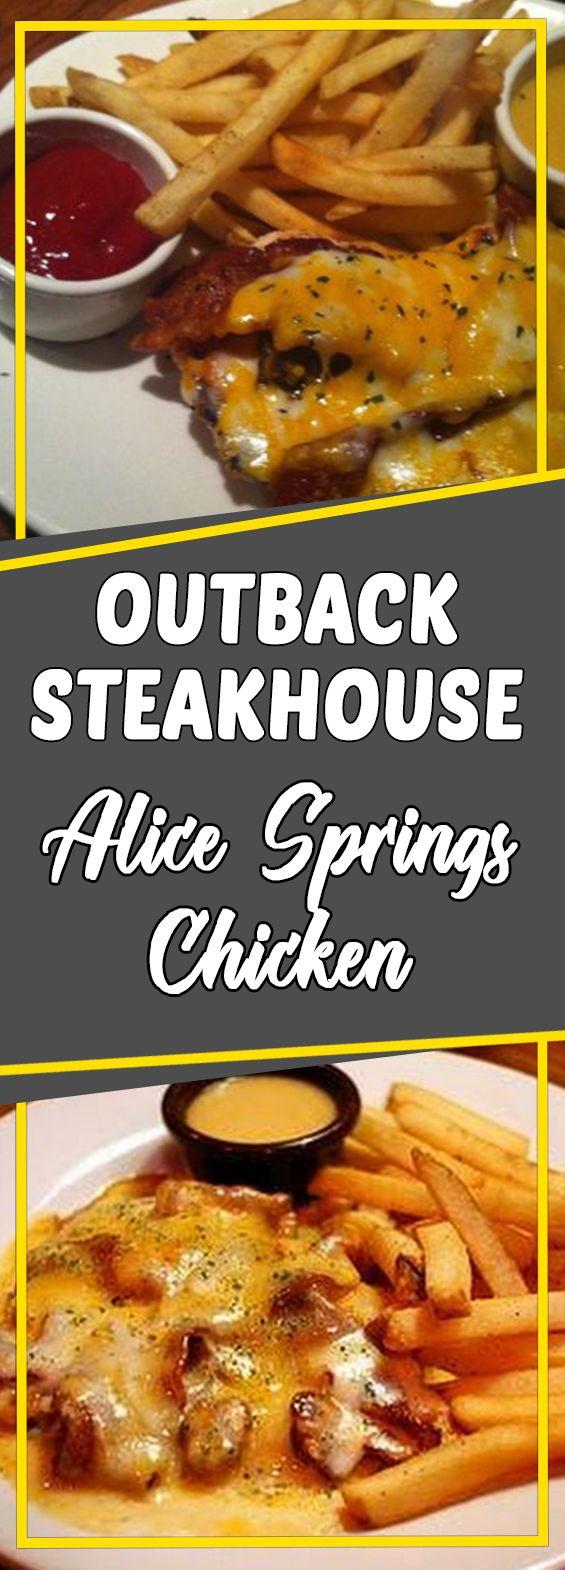 Outback Steakhouse Alice Springs Chicken #chickendinner #chickensalad #copycatrecipe #easyrecipes #chickencasserole #chicken